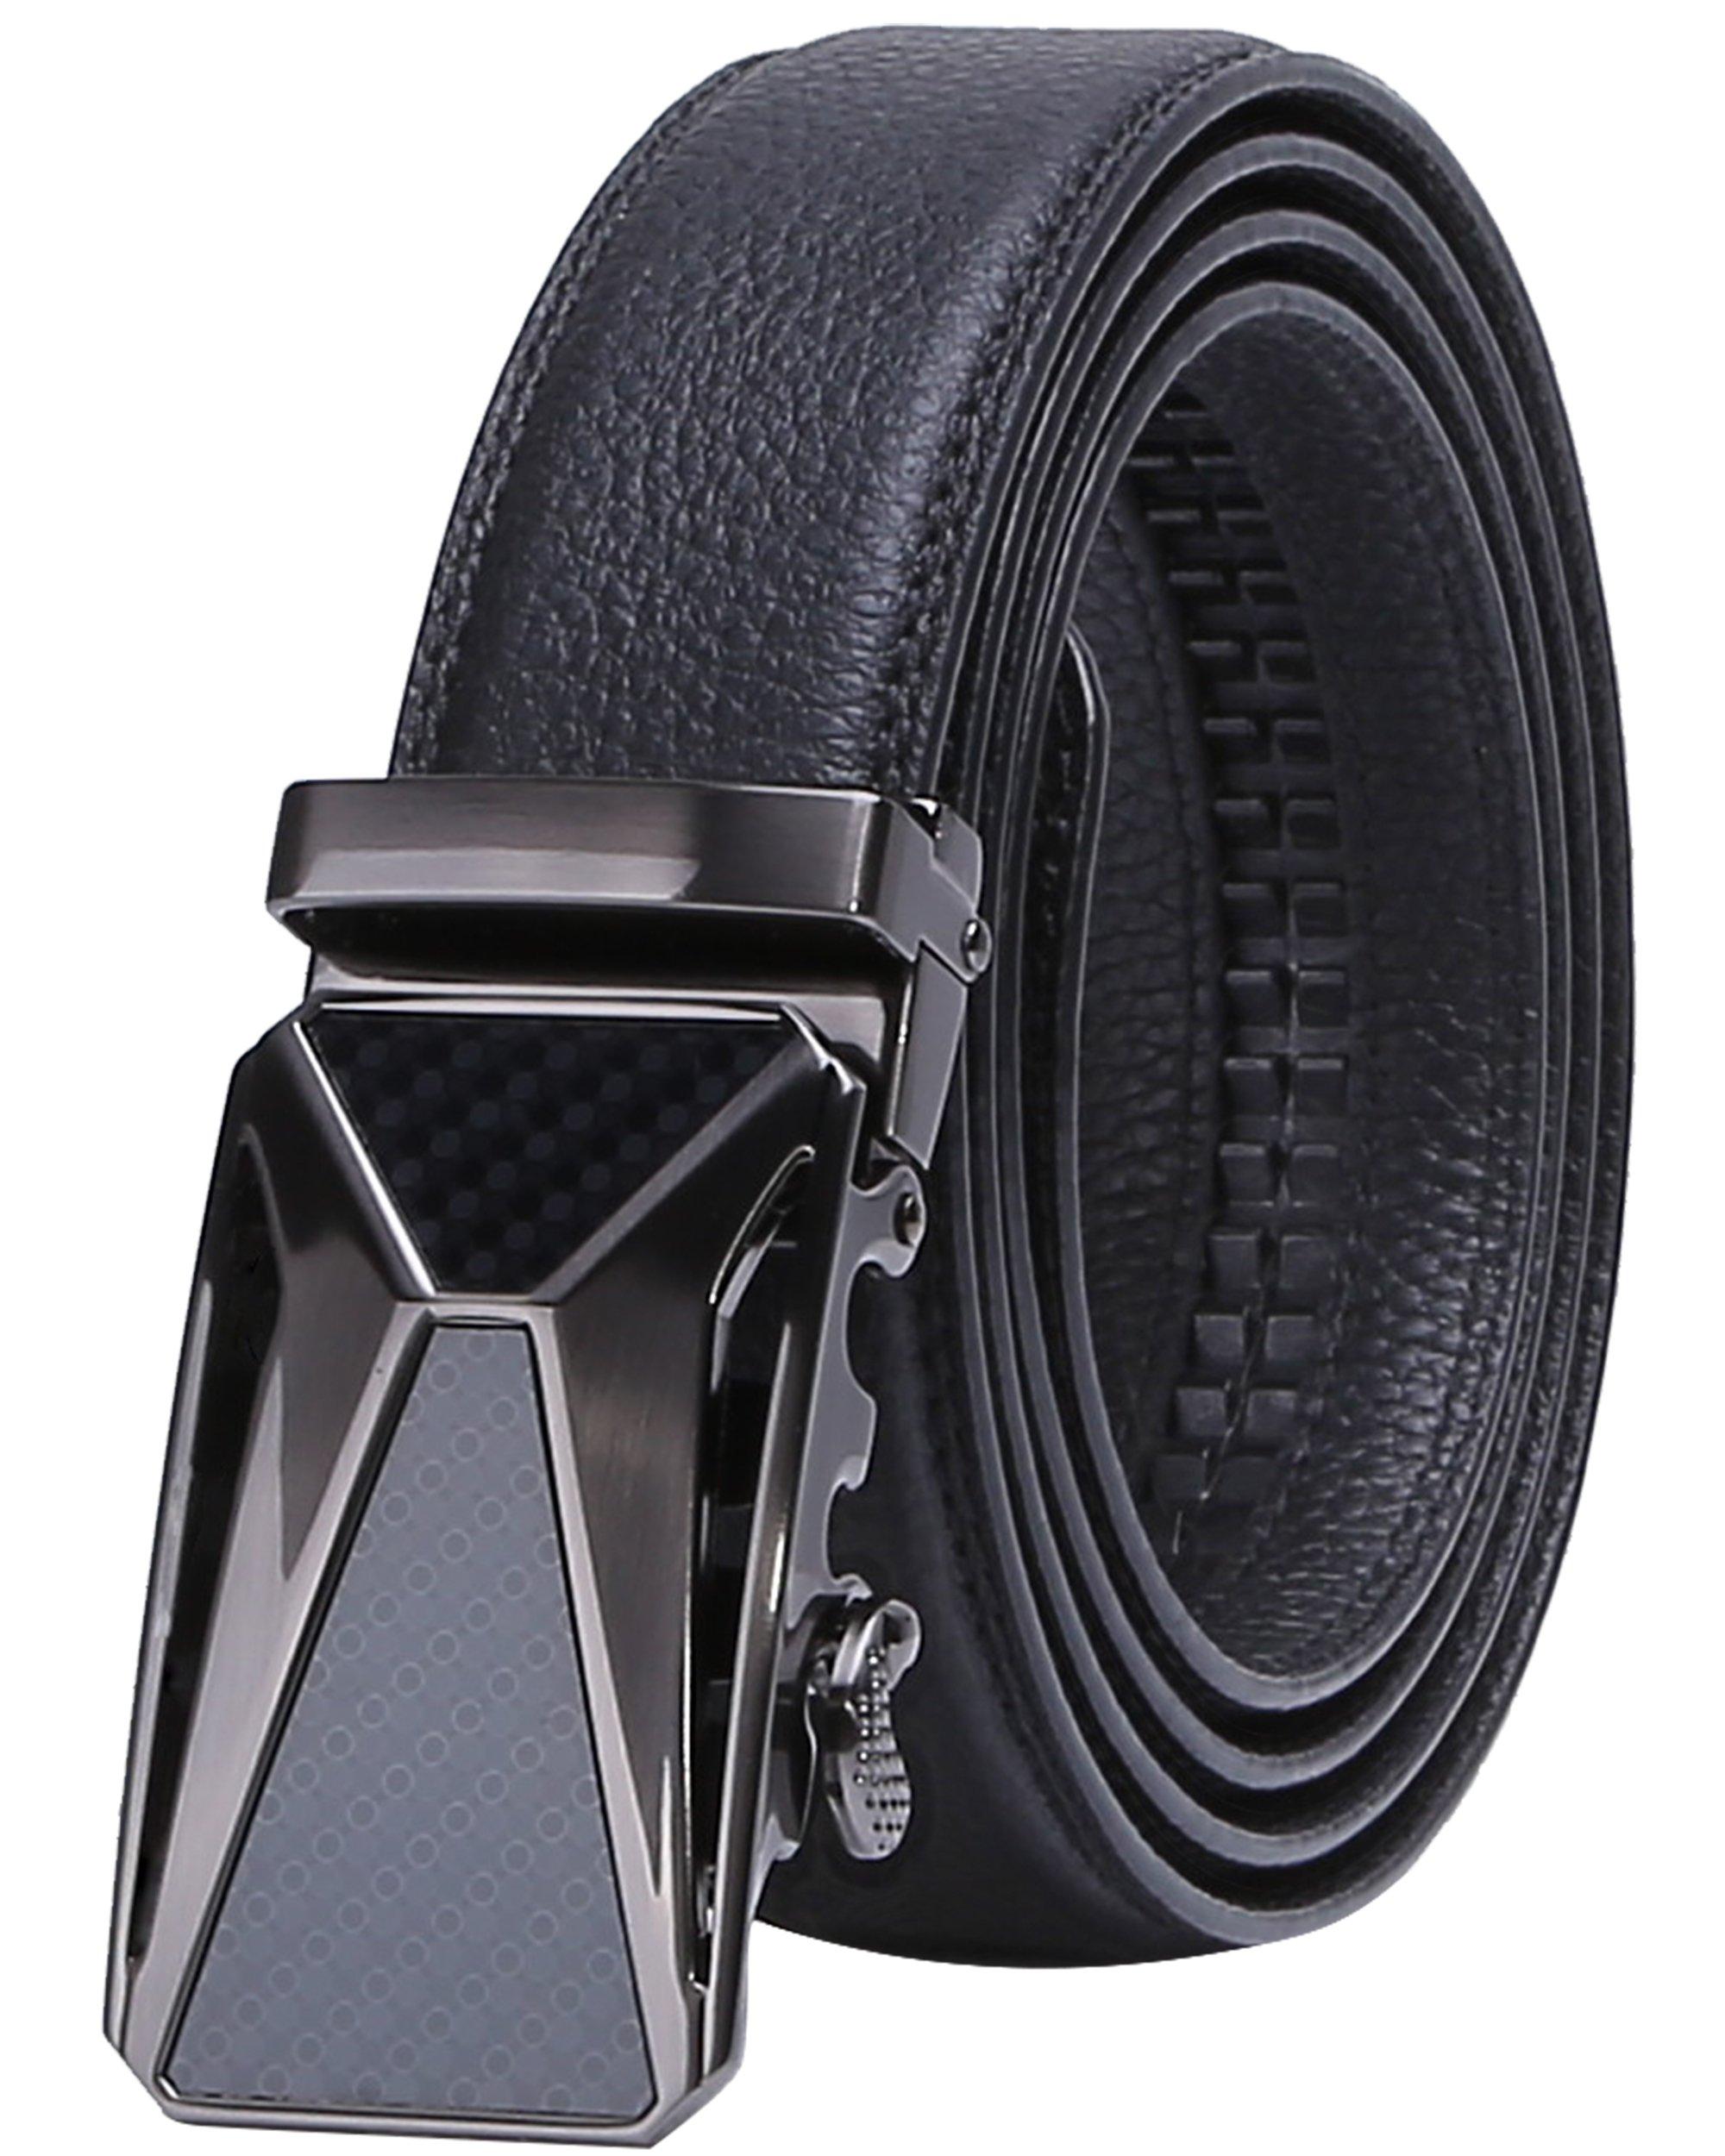 Men's Leather Belt, Black Ratchet Dress Slide Belt with Automatic Buckle 35mm